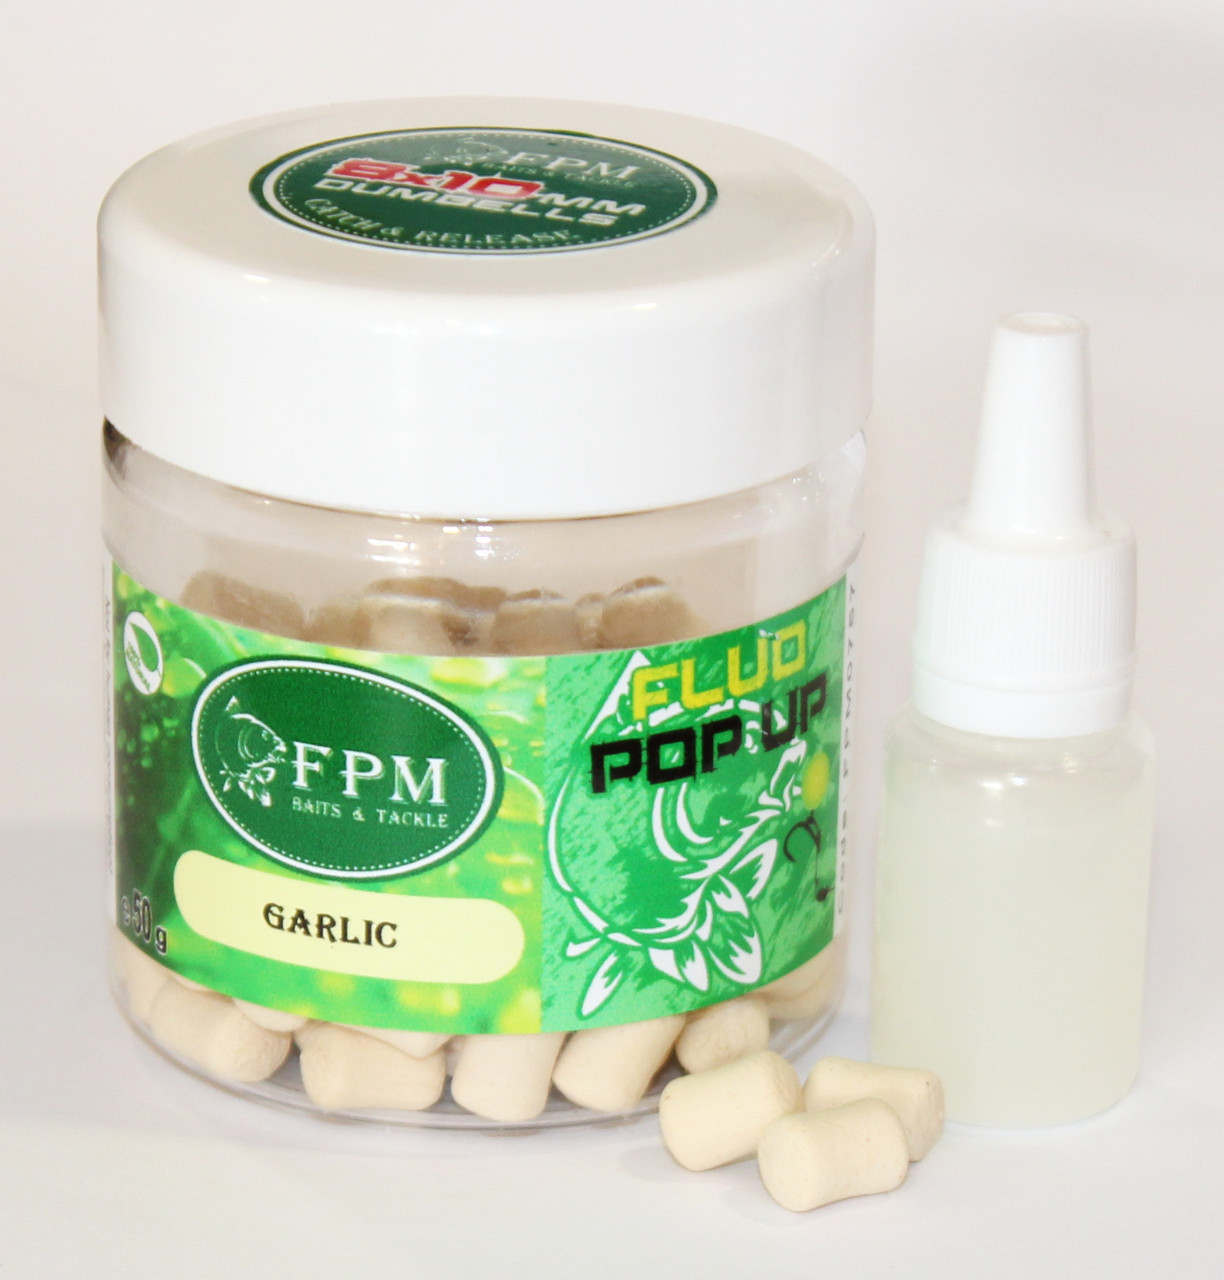 Dumbells FPM Pop-Up Fluo Garlic 8-10мм 50г в банке + Dip 10мл